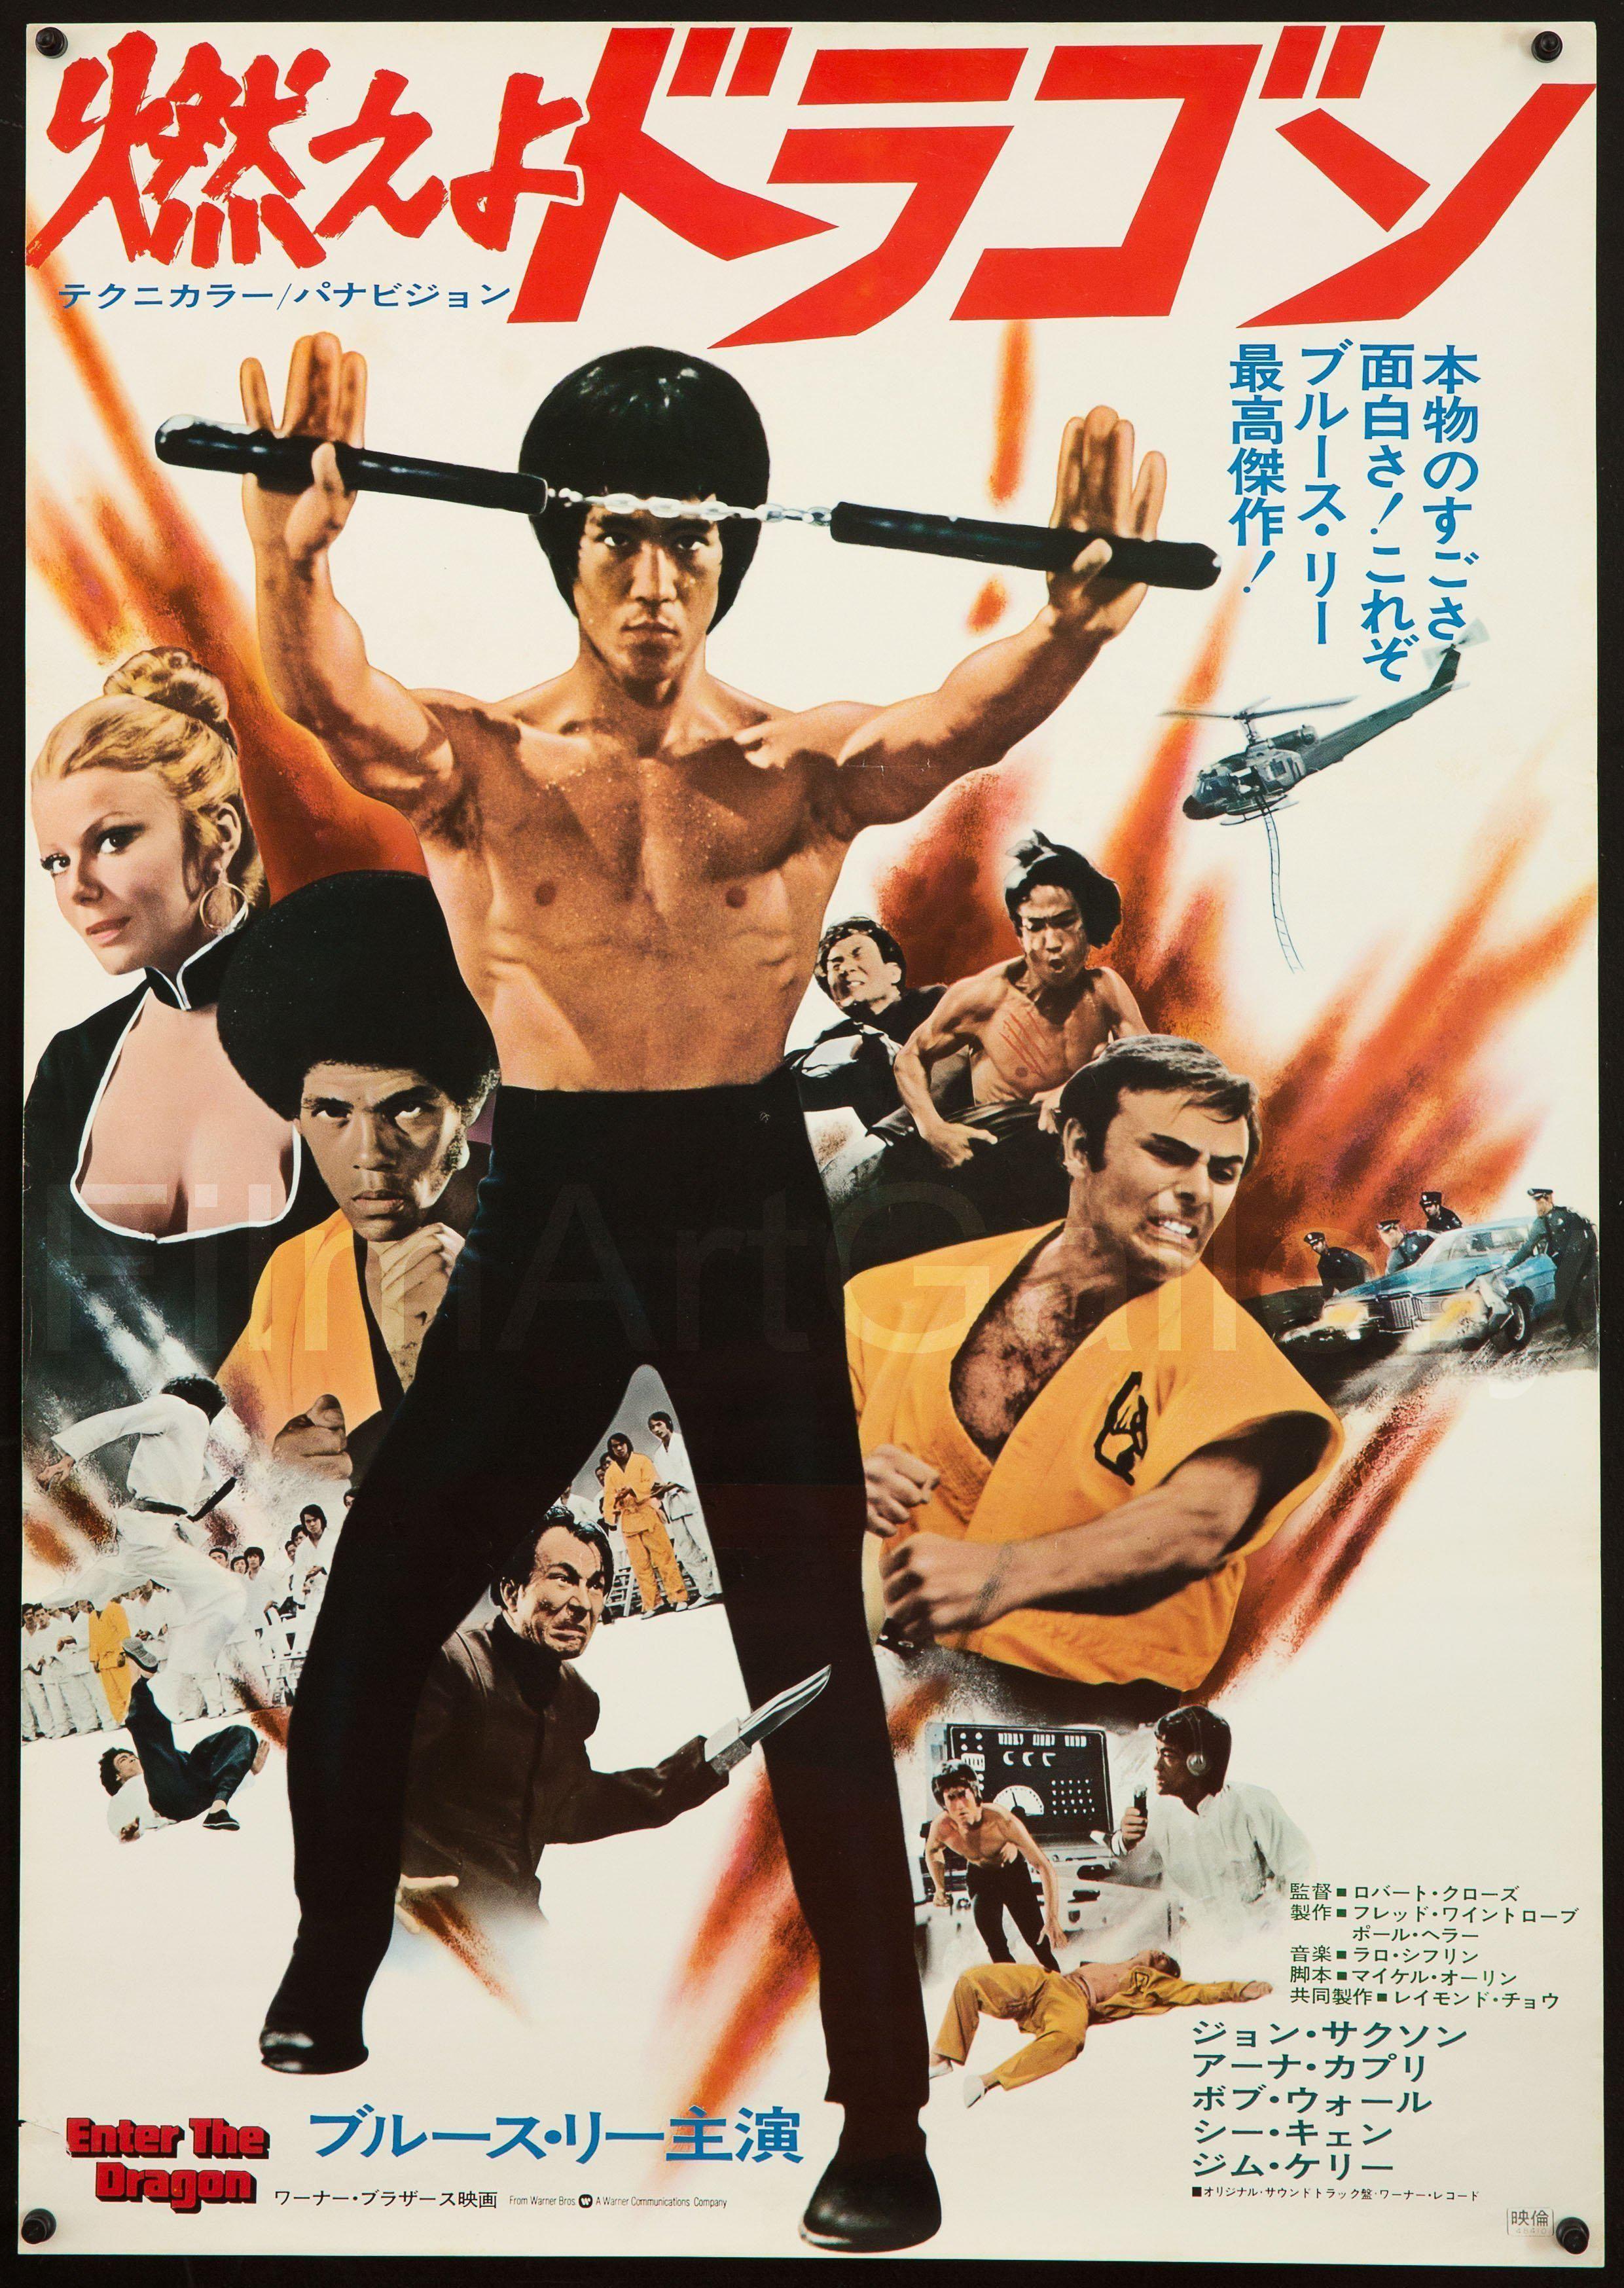 Enter The Dragon Vintage Movie Poster Japanese 1 Panel 20x29